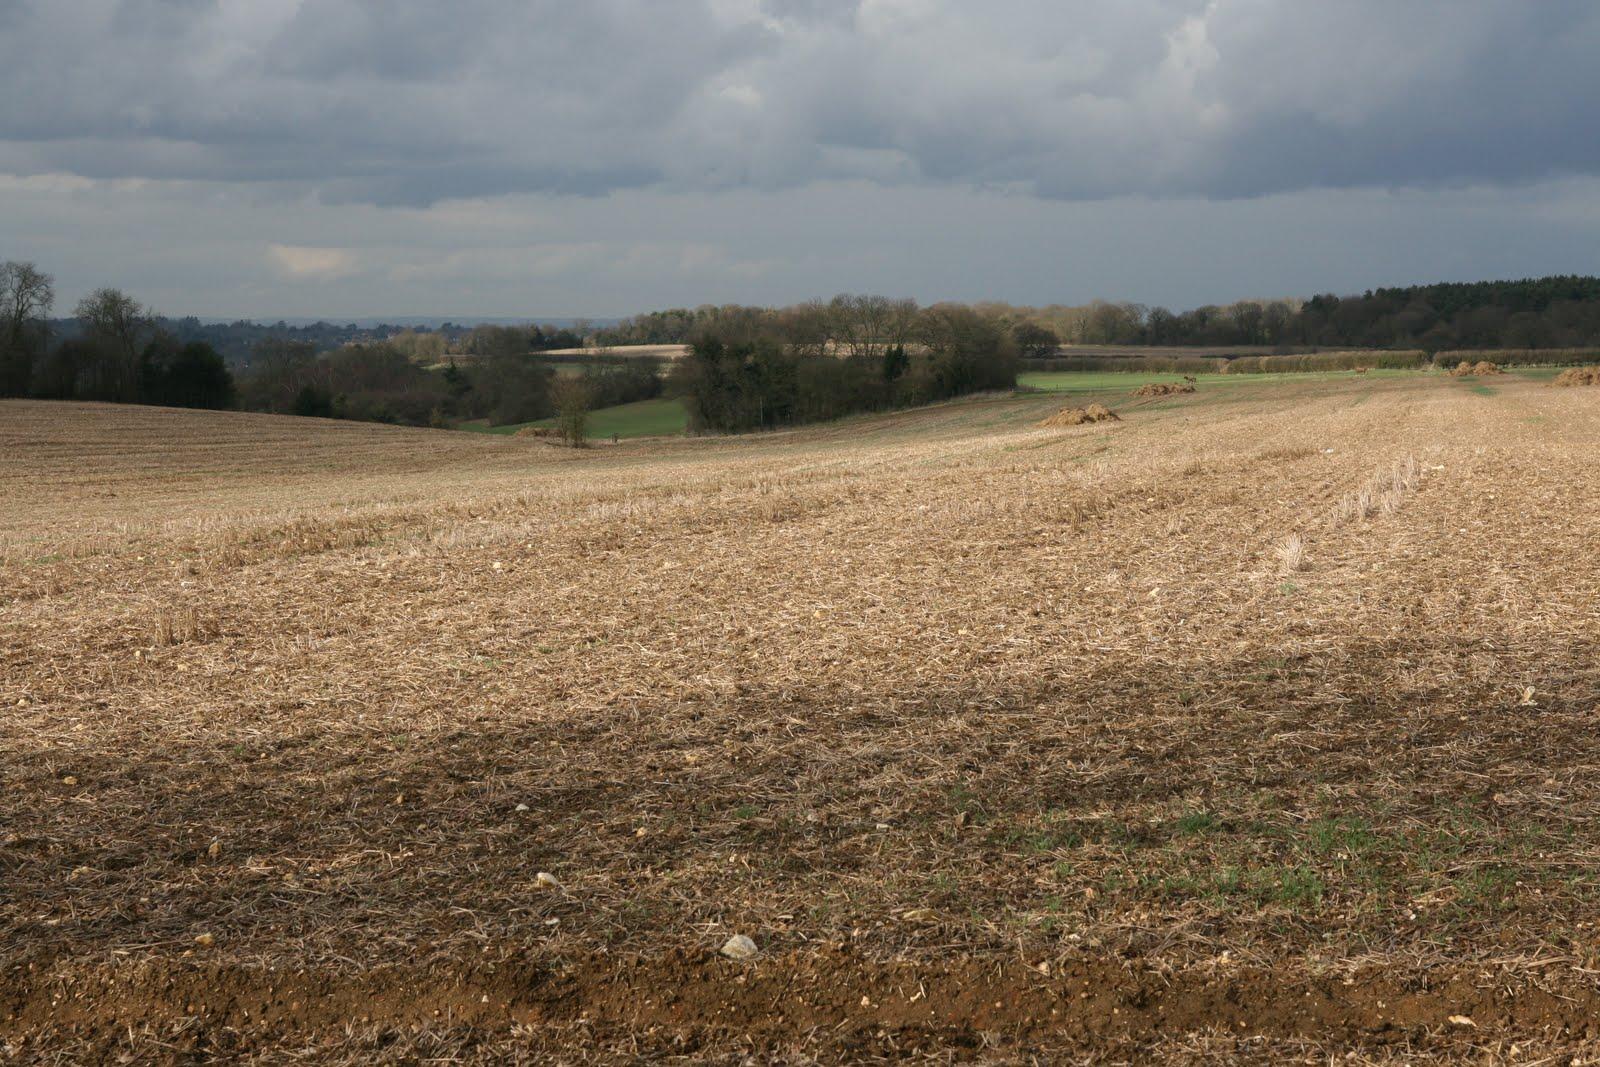 1003 008 Coulsdon, England Across the fields